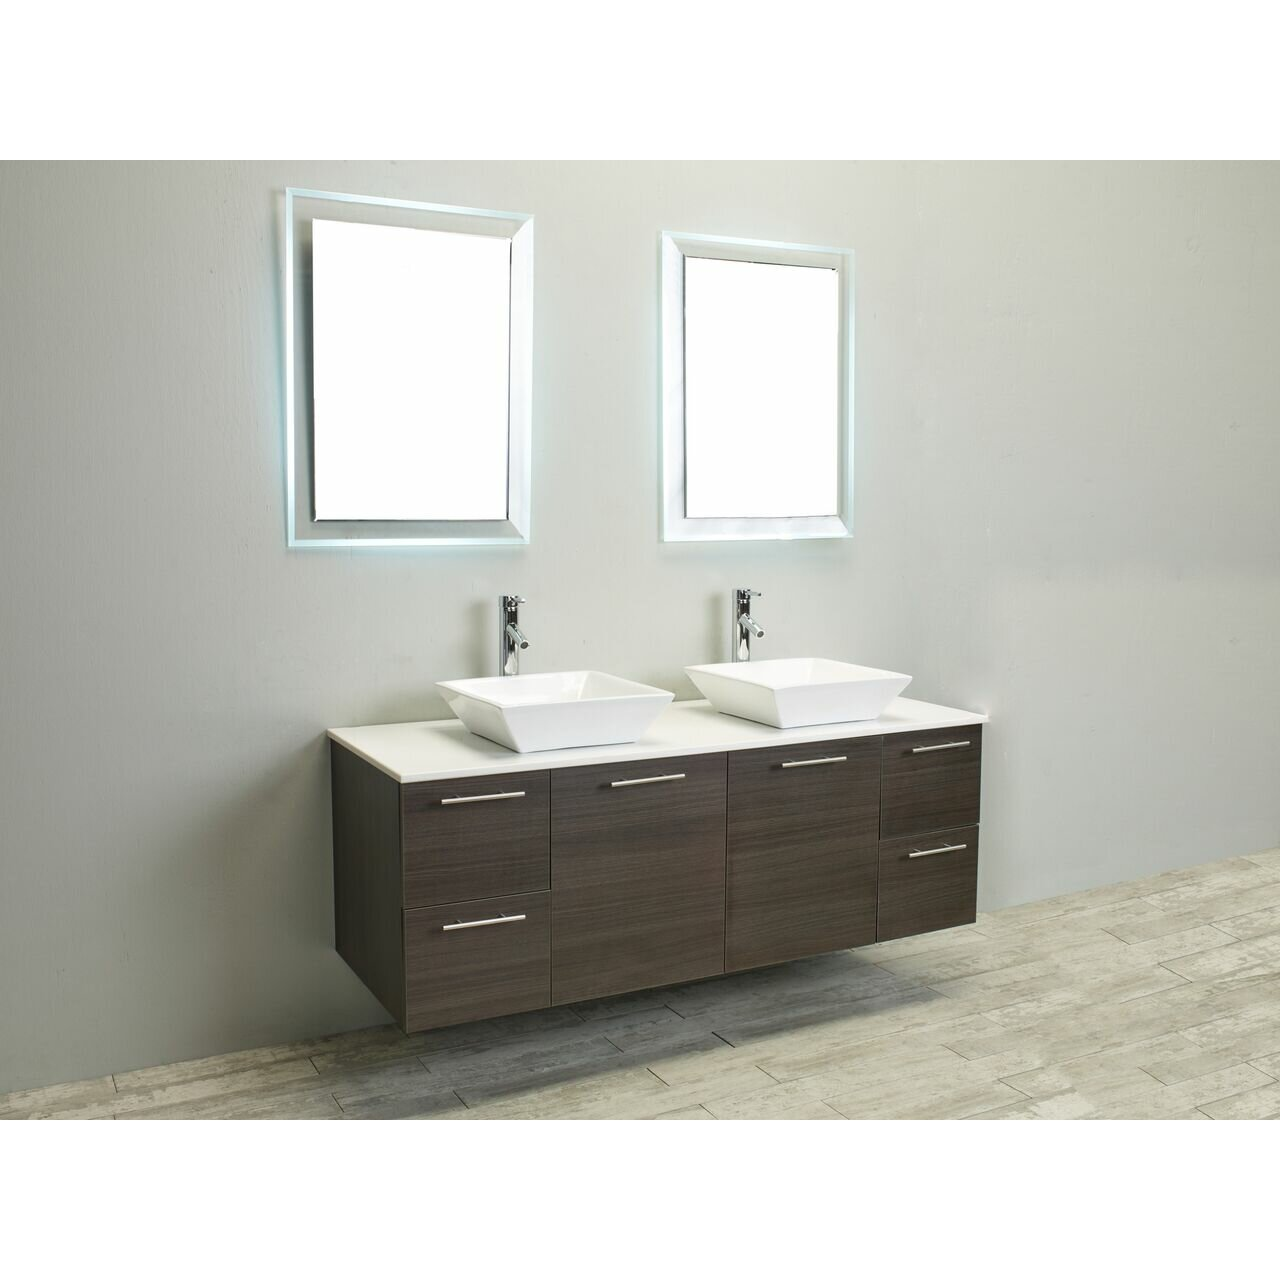 Expensive Bathroom Vanity